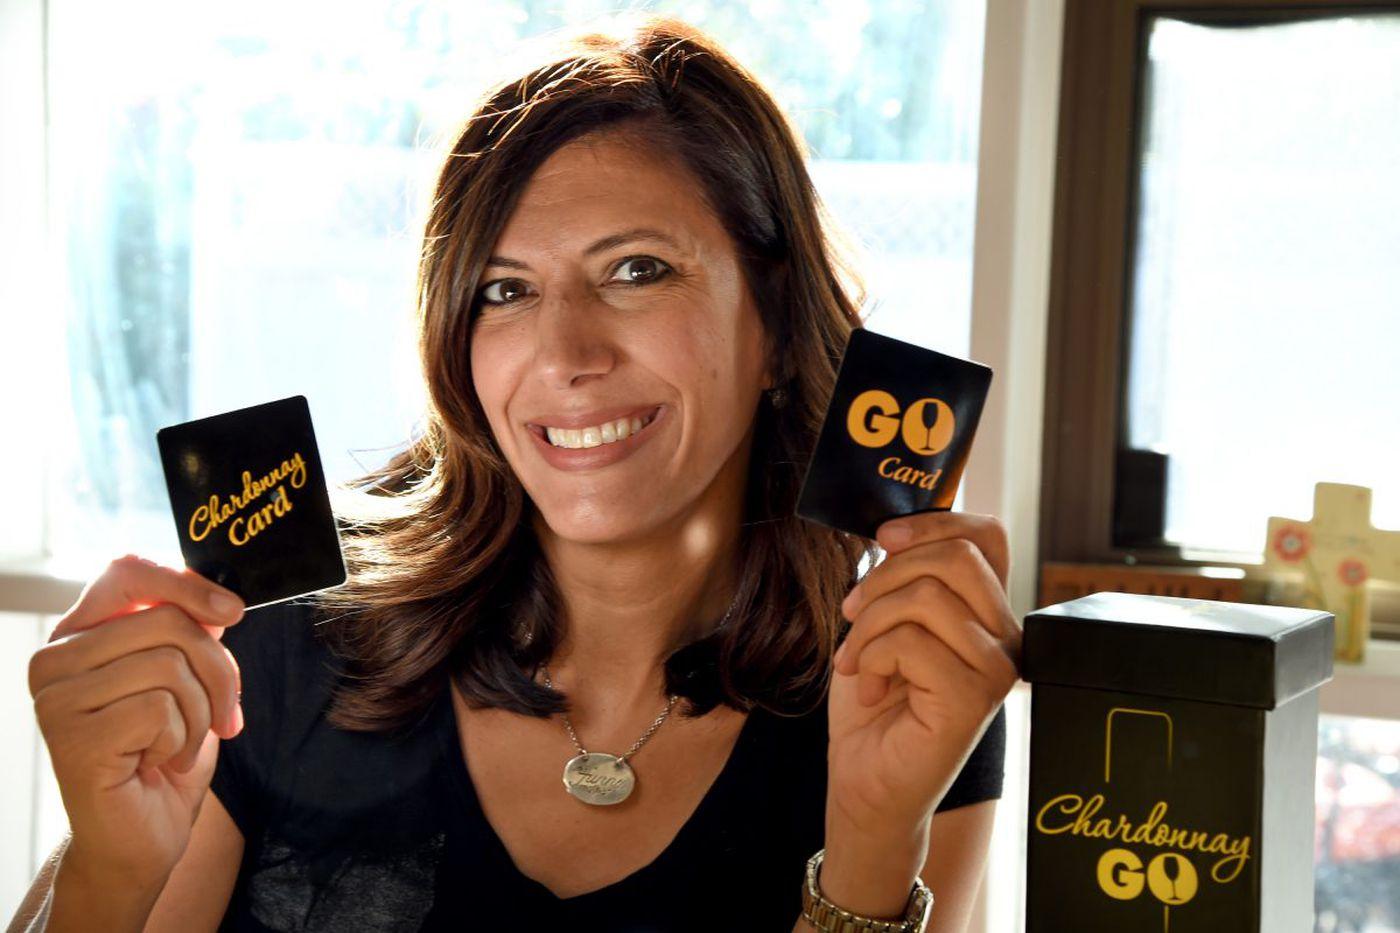 N.J. mom goes from viral video to board game entrepreneur | Elizabeth Wellington